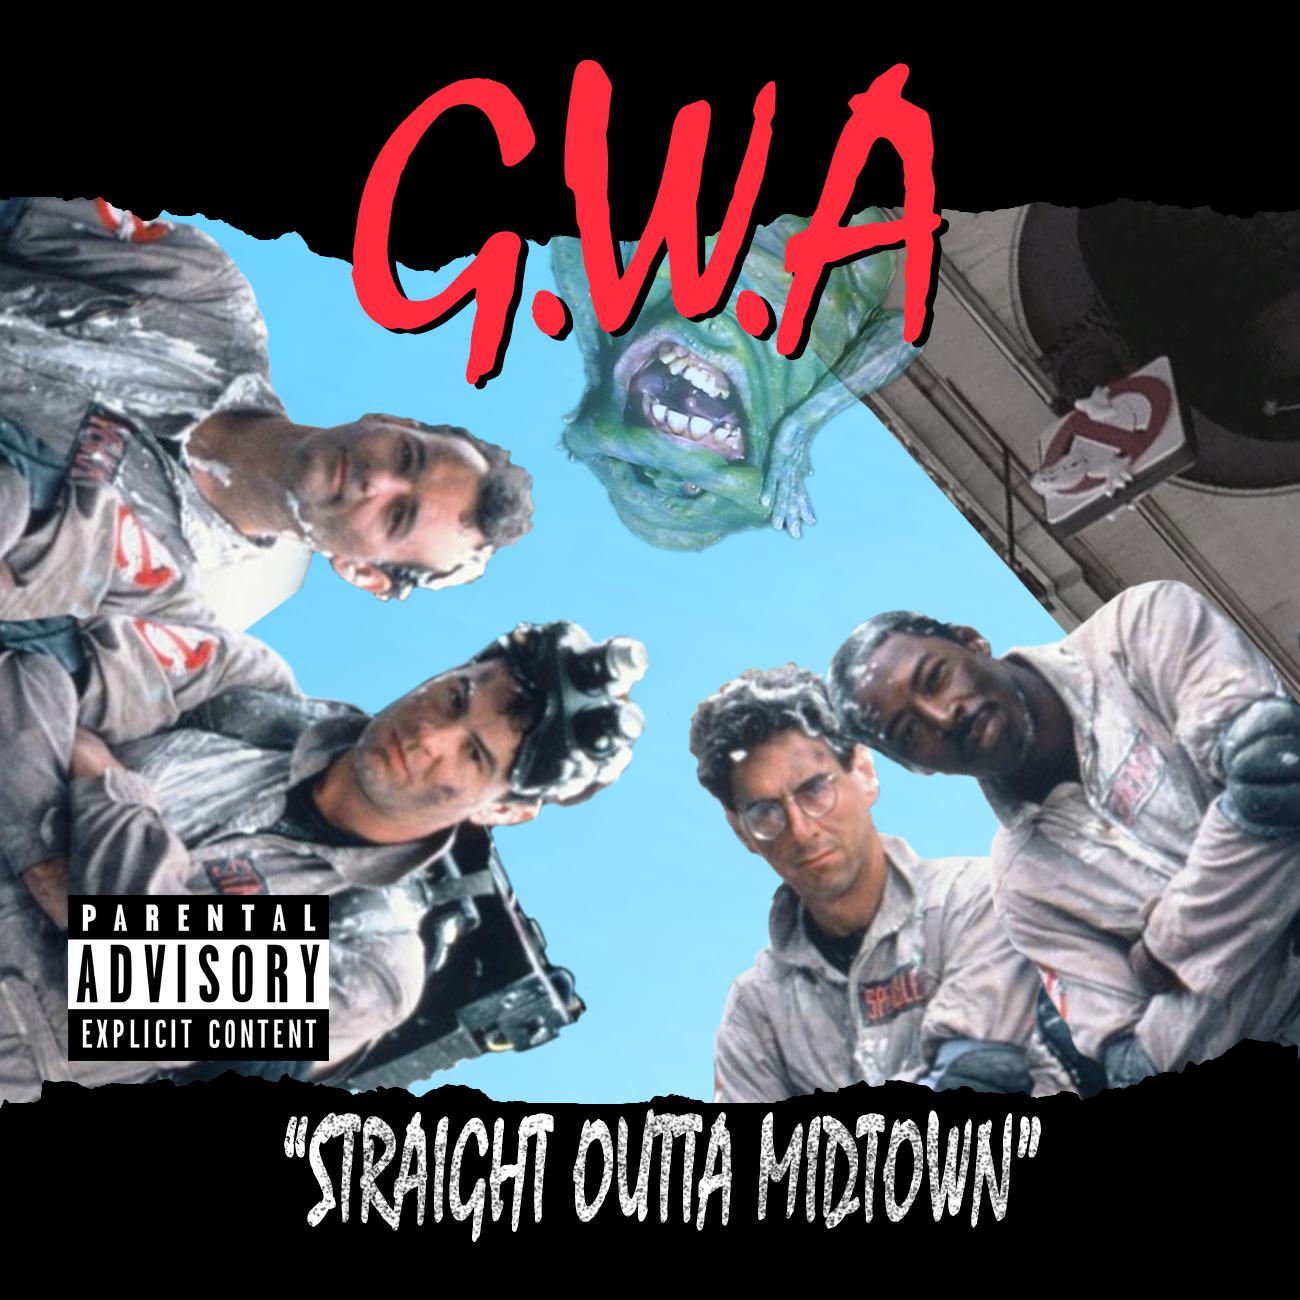 NWA-GHOSTBUSTERS